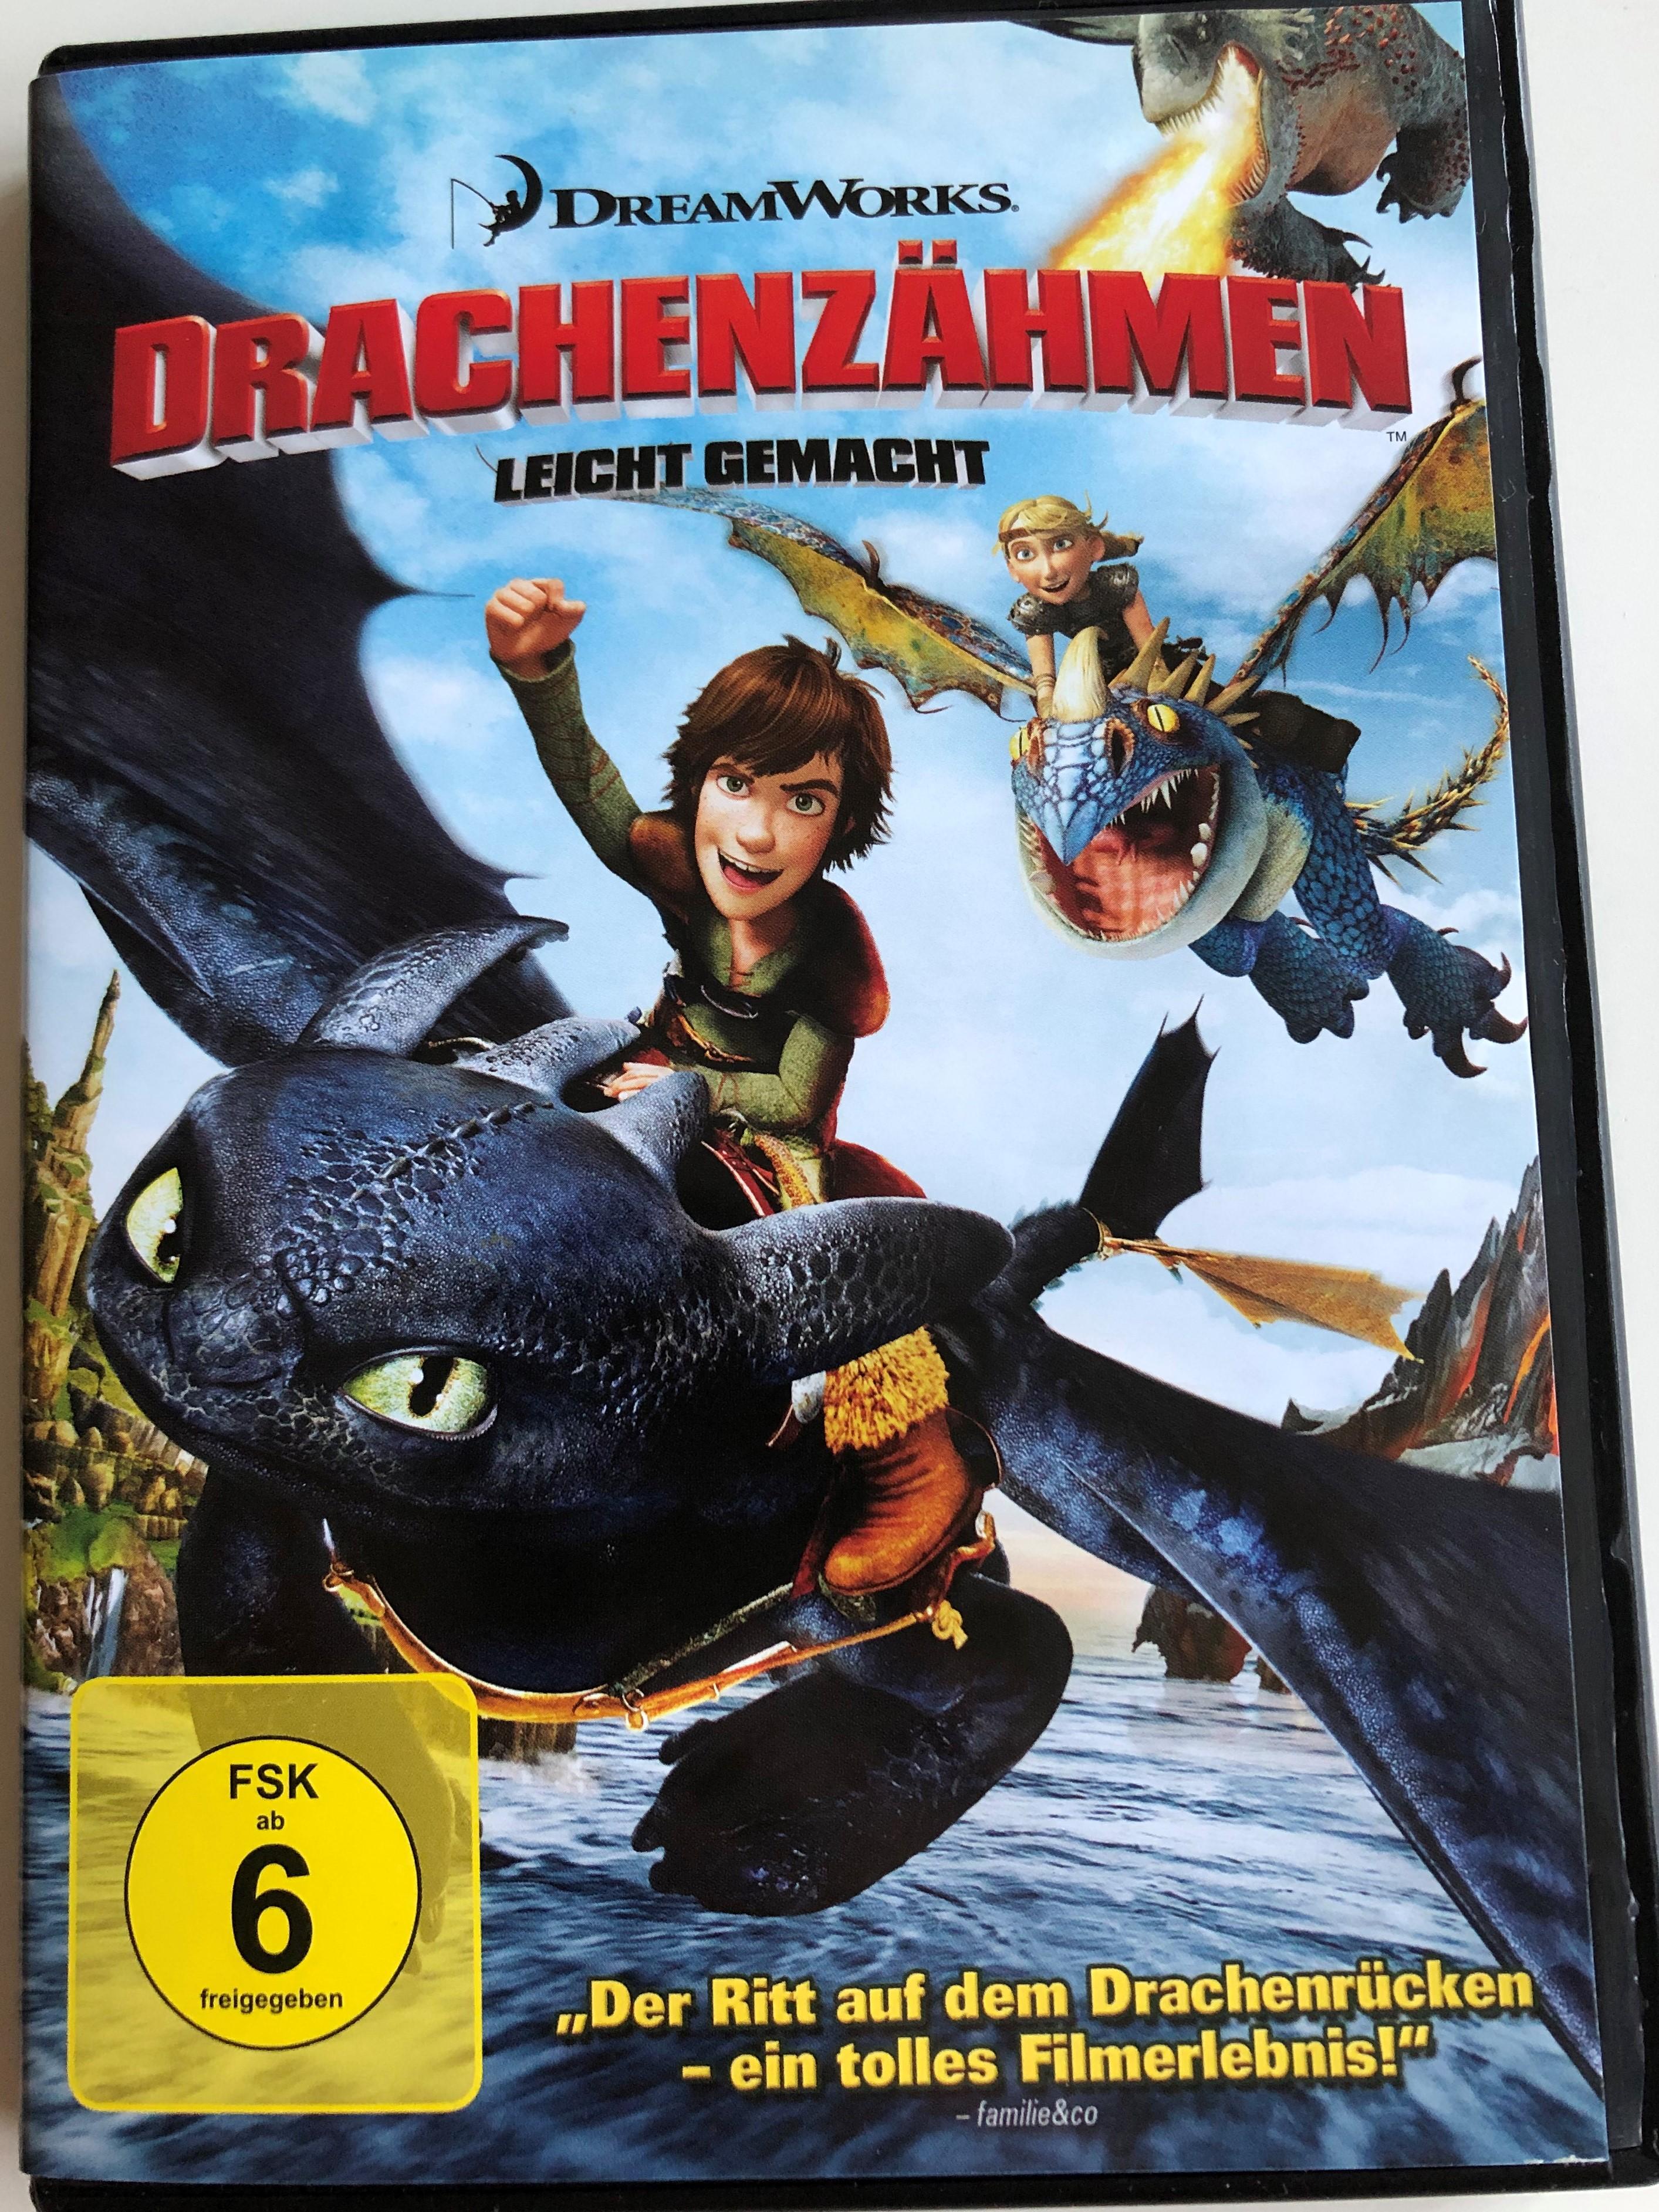 how-to-train-your-dragon-dvd-2010-drachenz-hmen-leicht-gemacht-directed-by-chris-sanders-dean-deblois-starring-jay-baruchel-gerard-butler-craig-ferguson-america-ferrera-jonah-hill-christopher-mintz-plasse-t.-j.-mille-1-.jpg